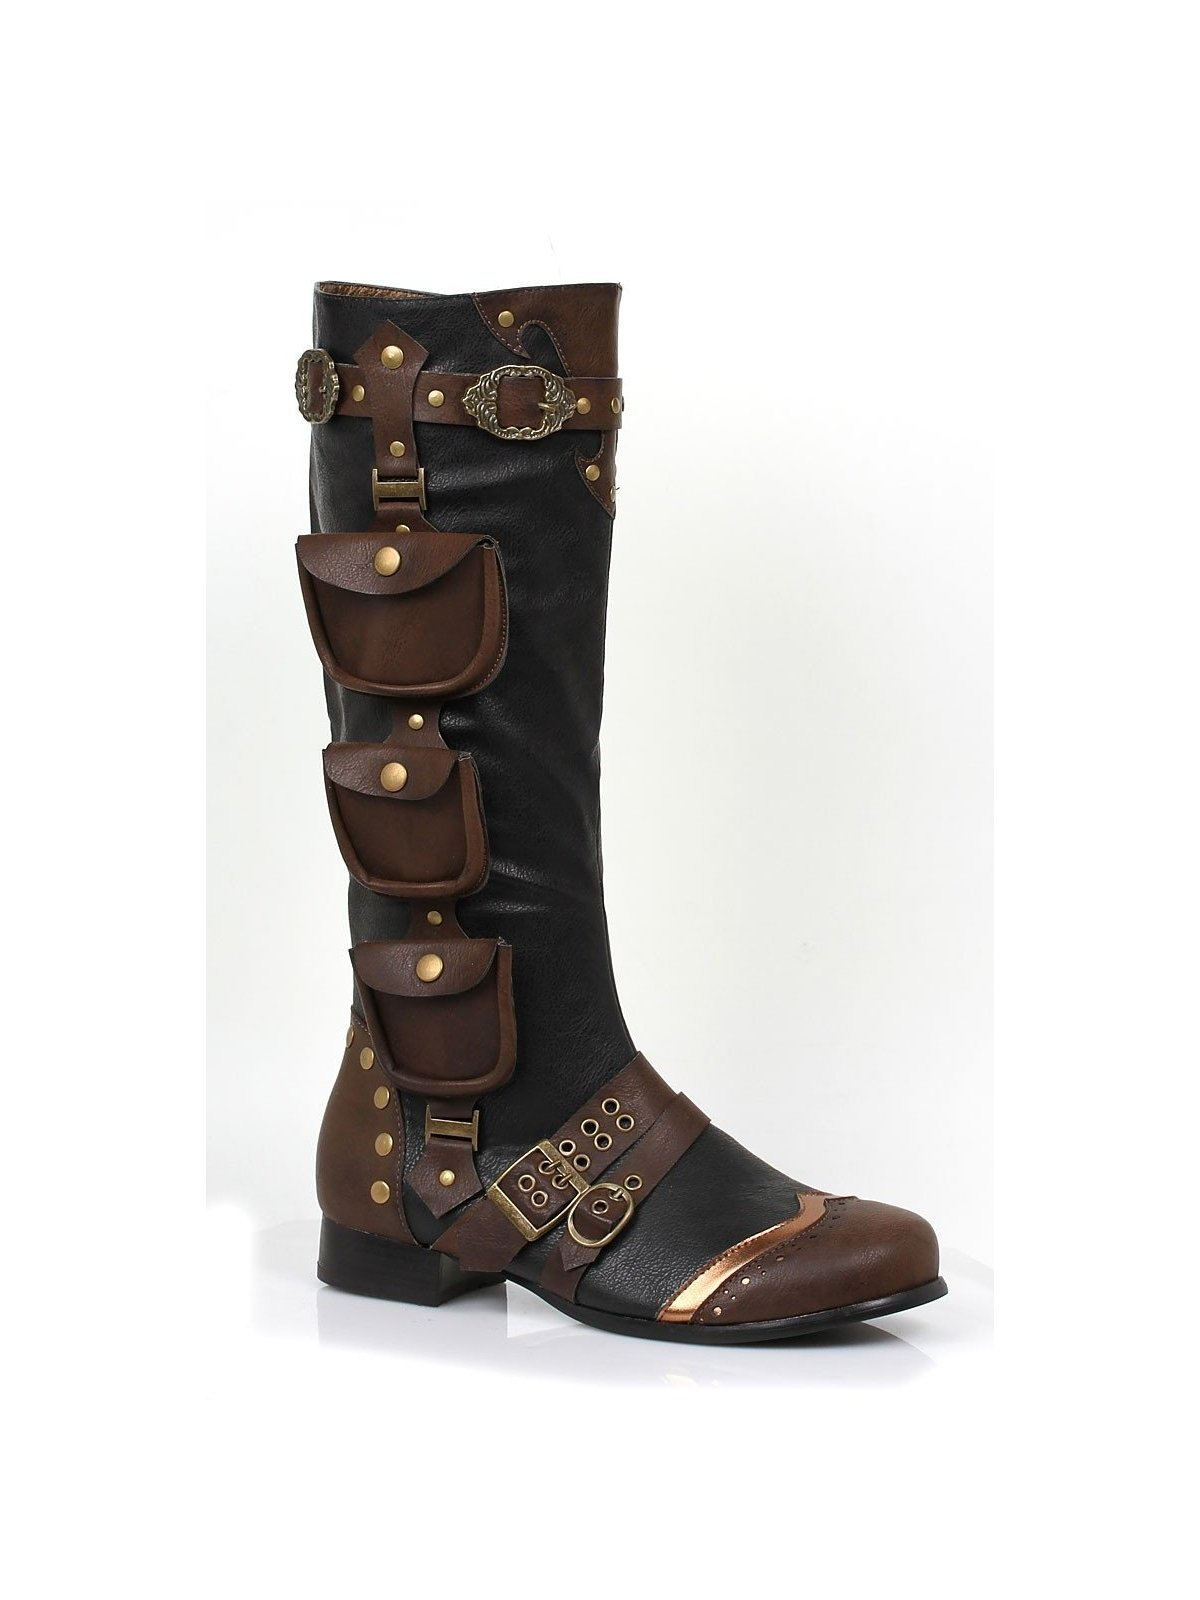 Heel Knee High Boots(Sizes